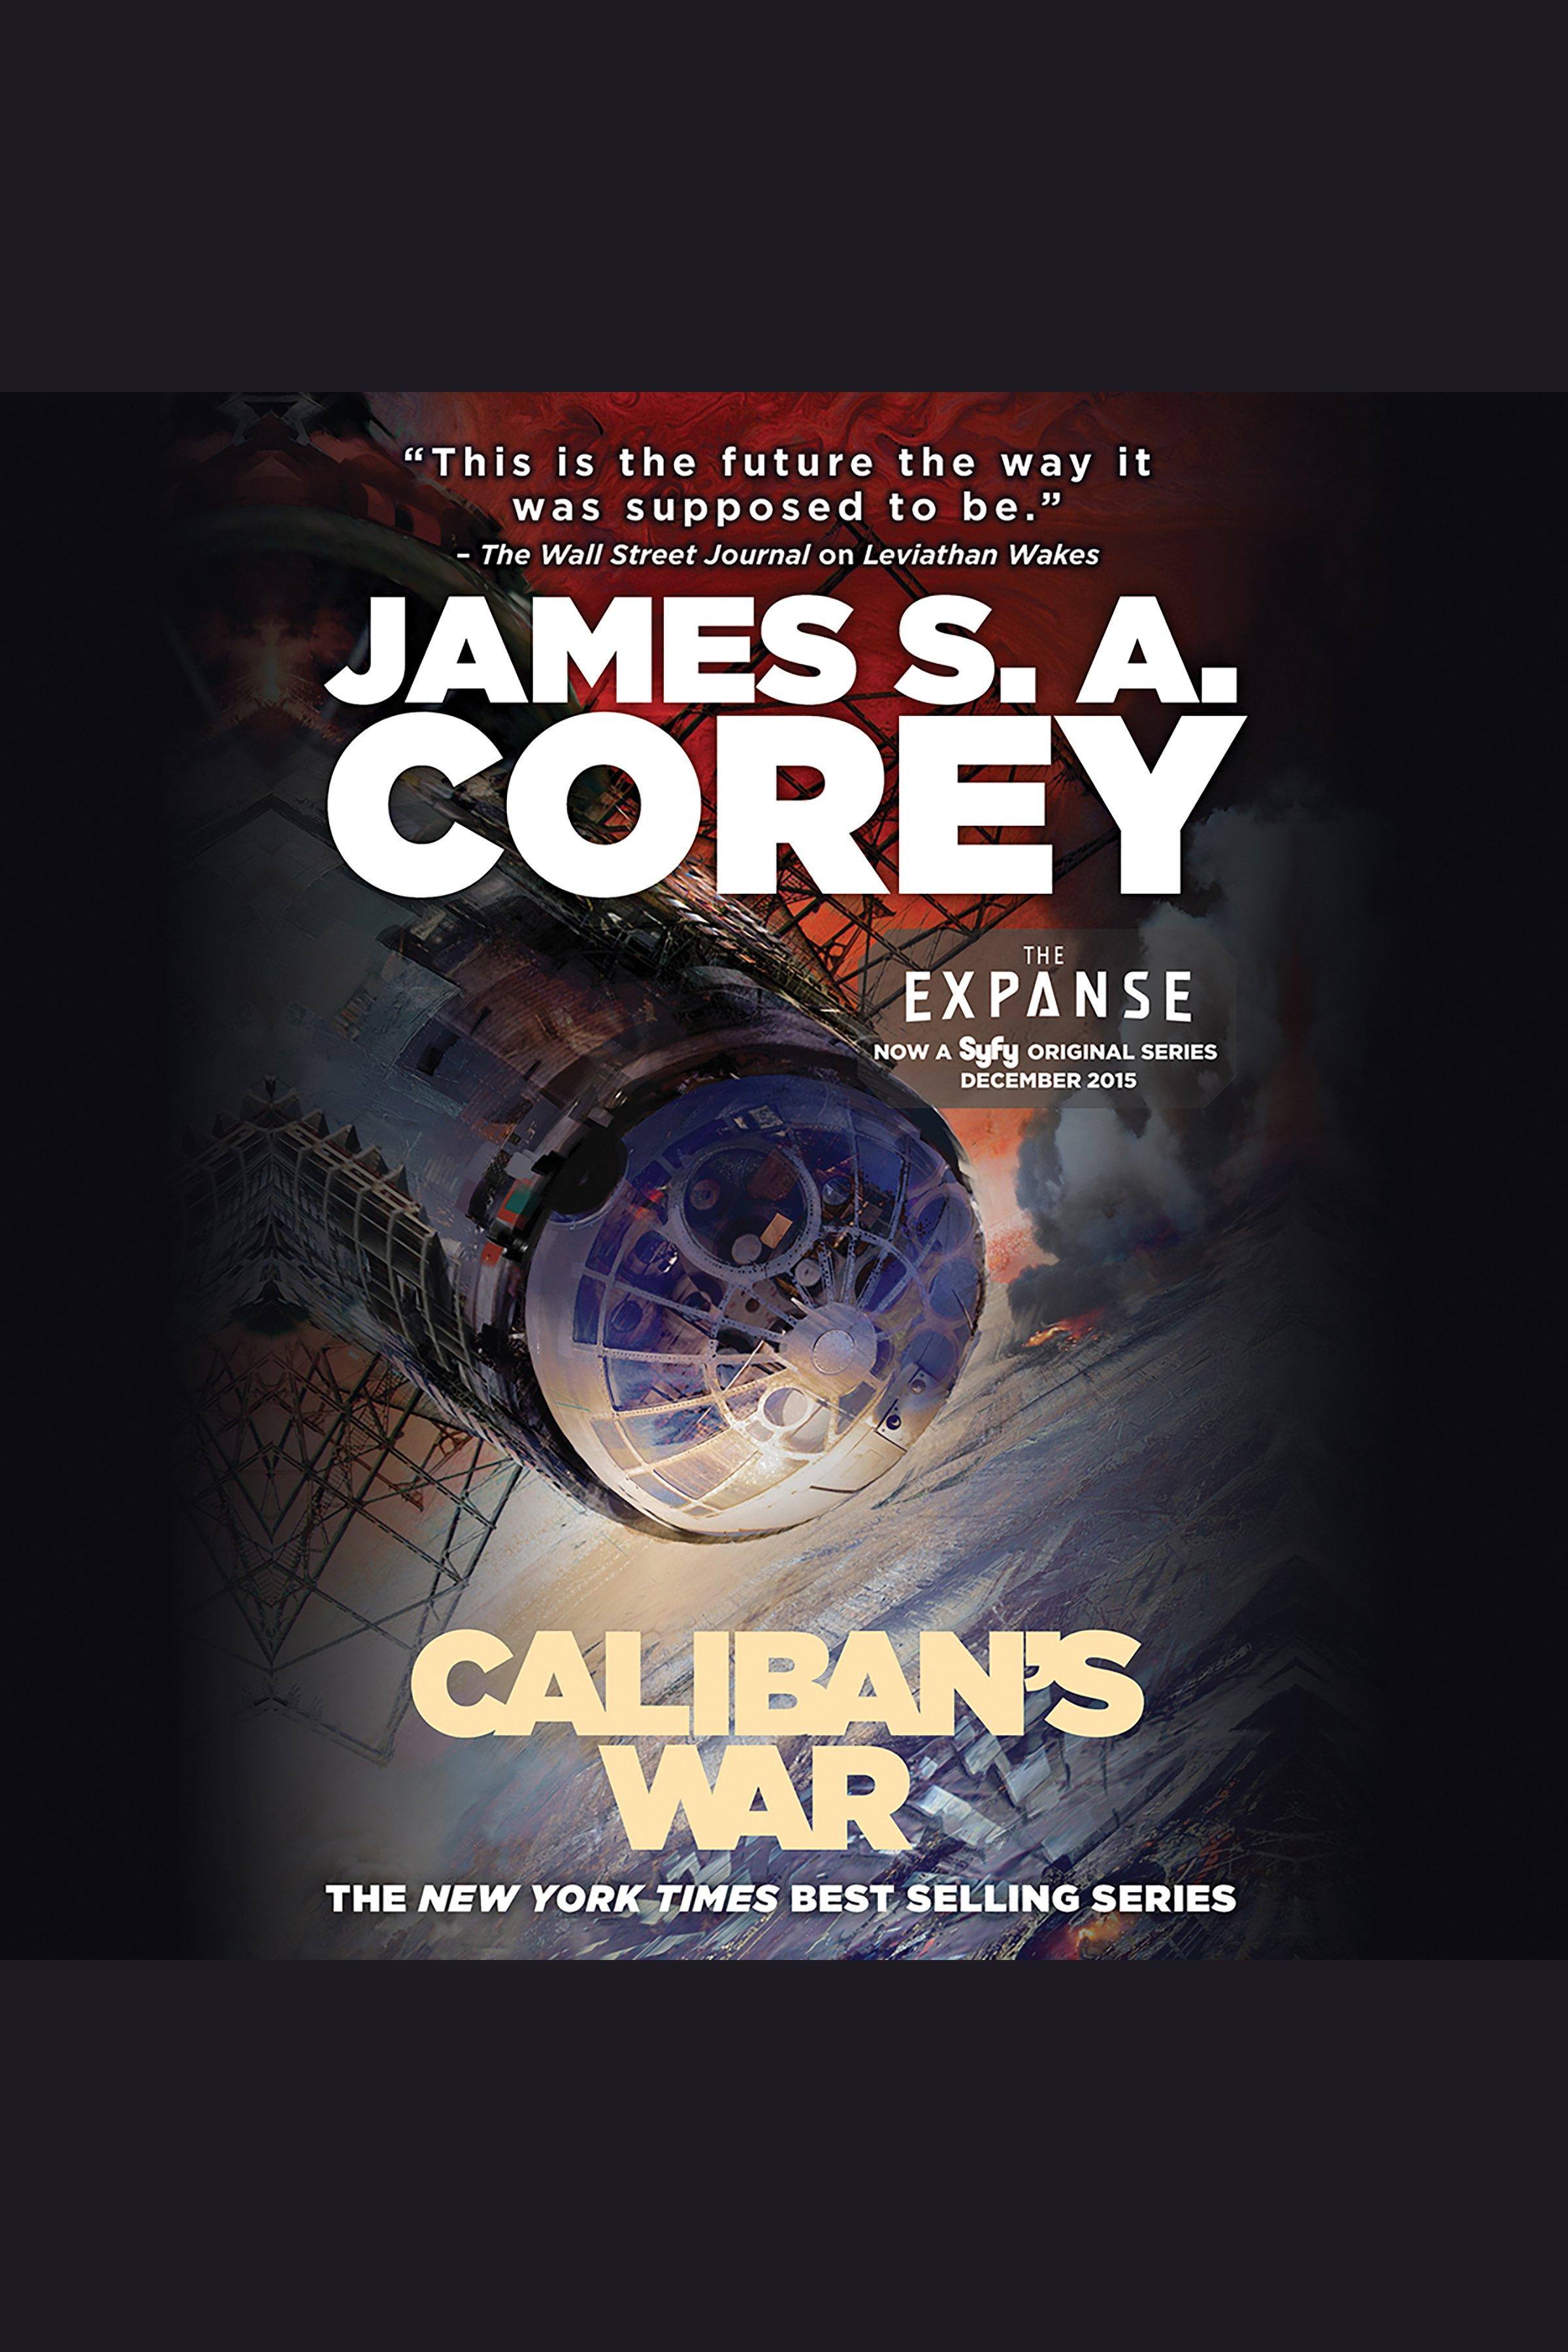 Caliban's War cover image